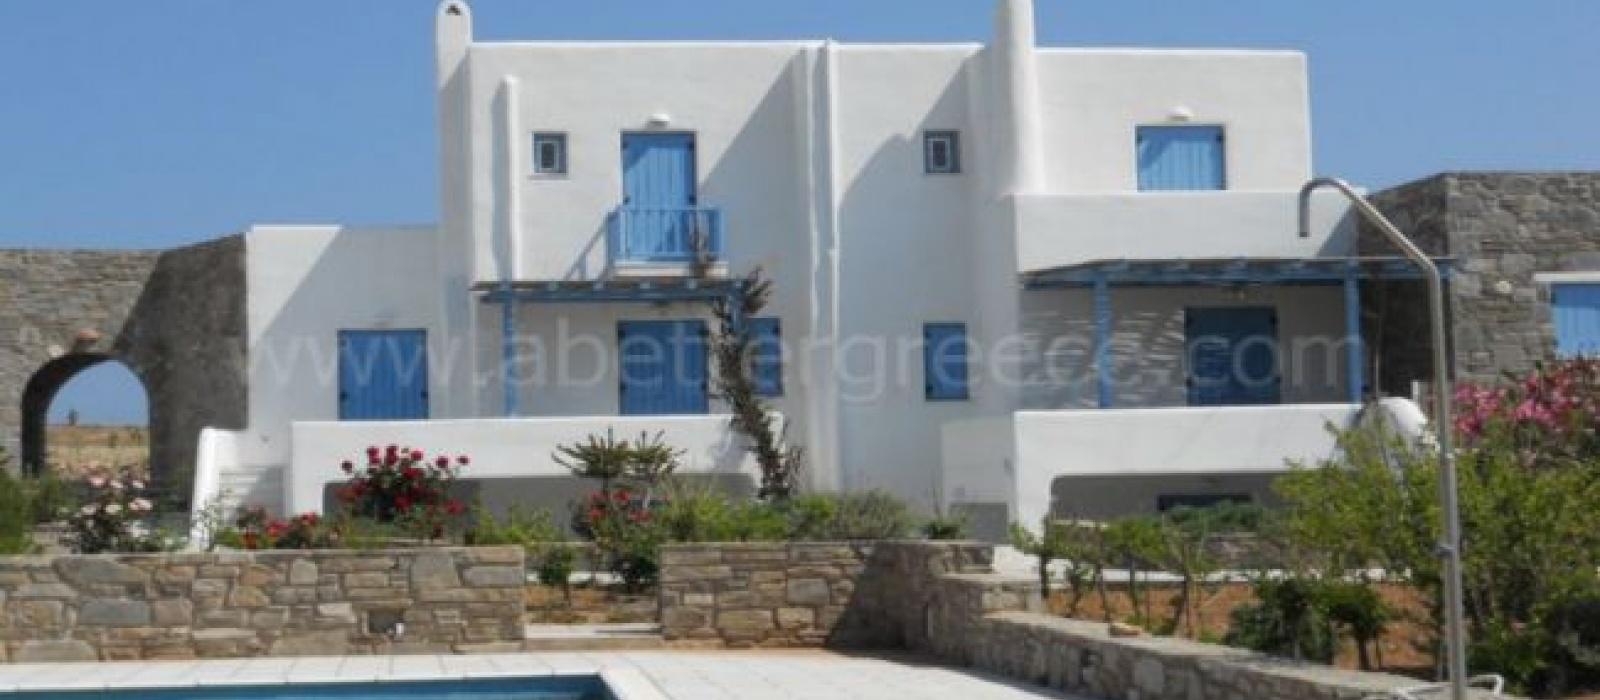 Paros, villas, houses, real estate, holidays, Greek islands, vacations, guide